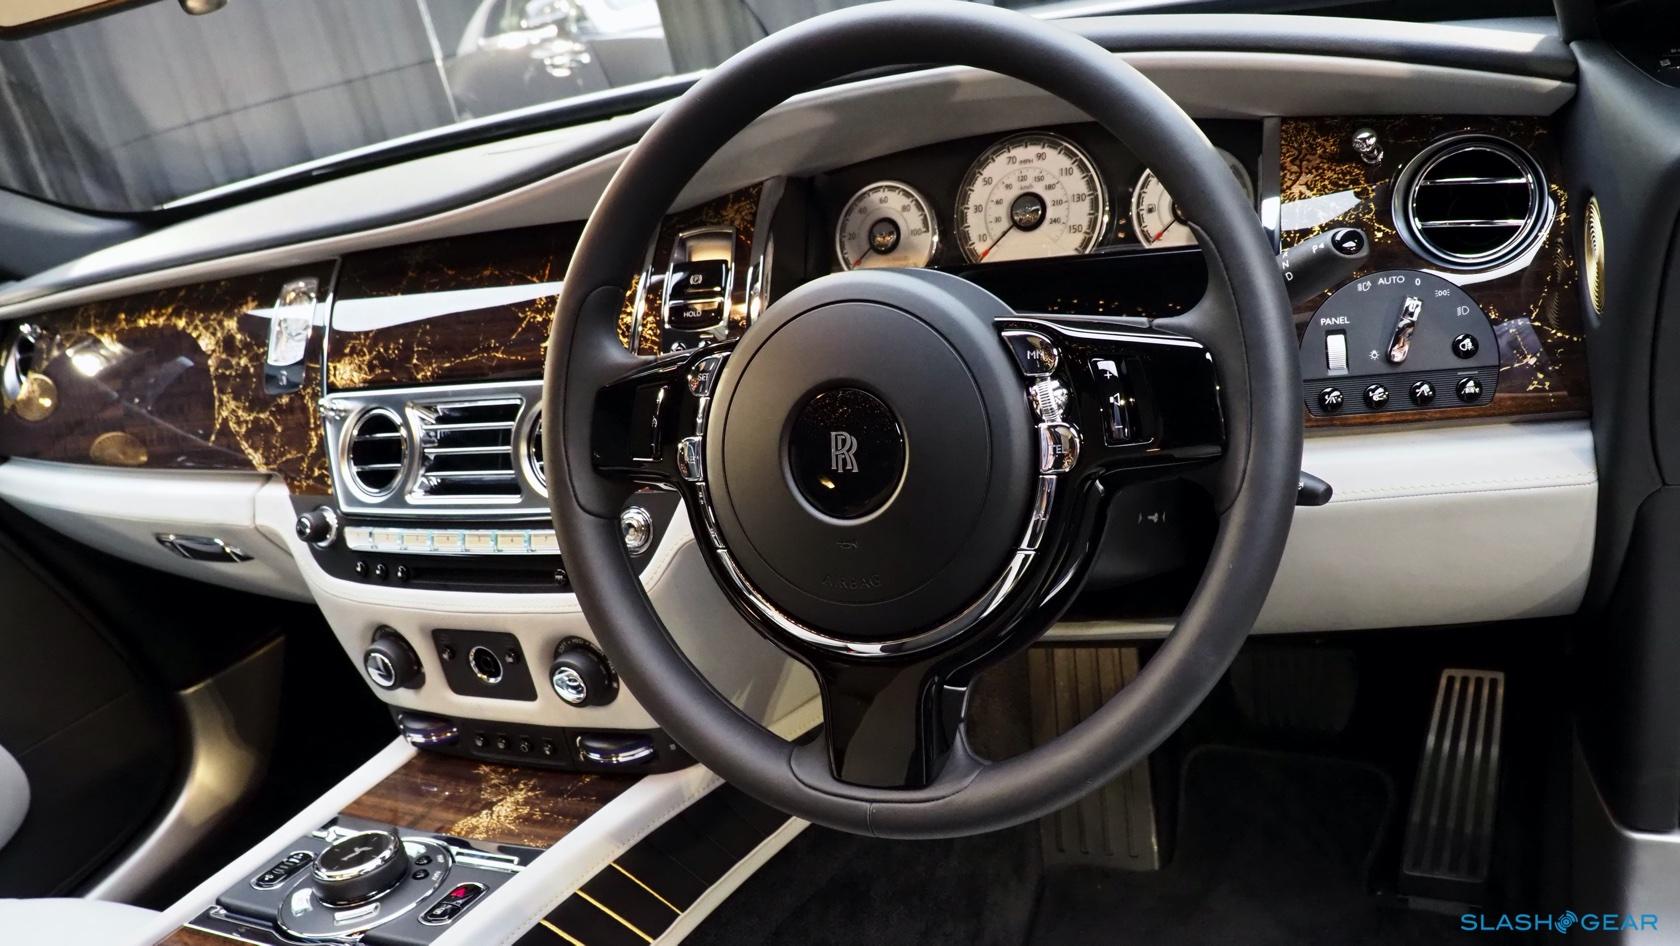 The Rolls Royce Wraith Eagle Viii Takes Bespoke To The Next Level Slashgear